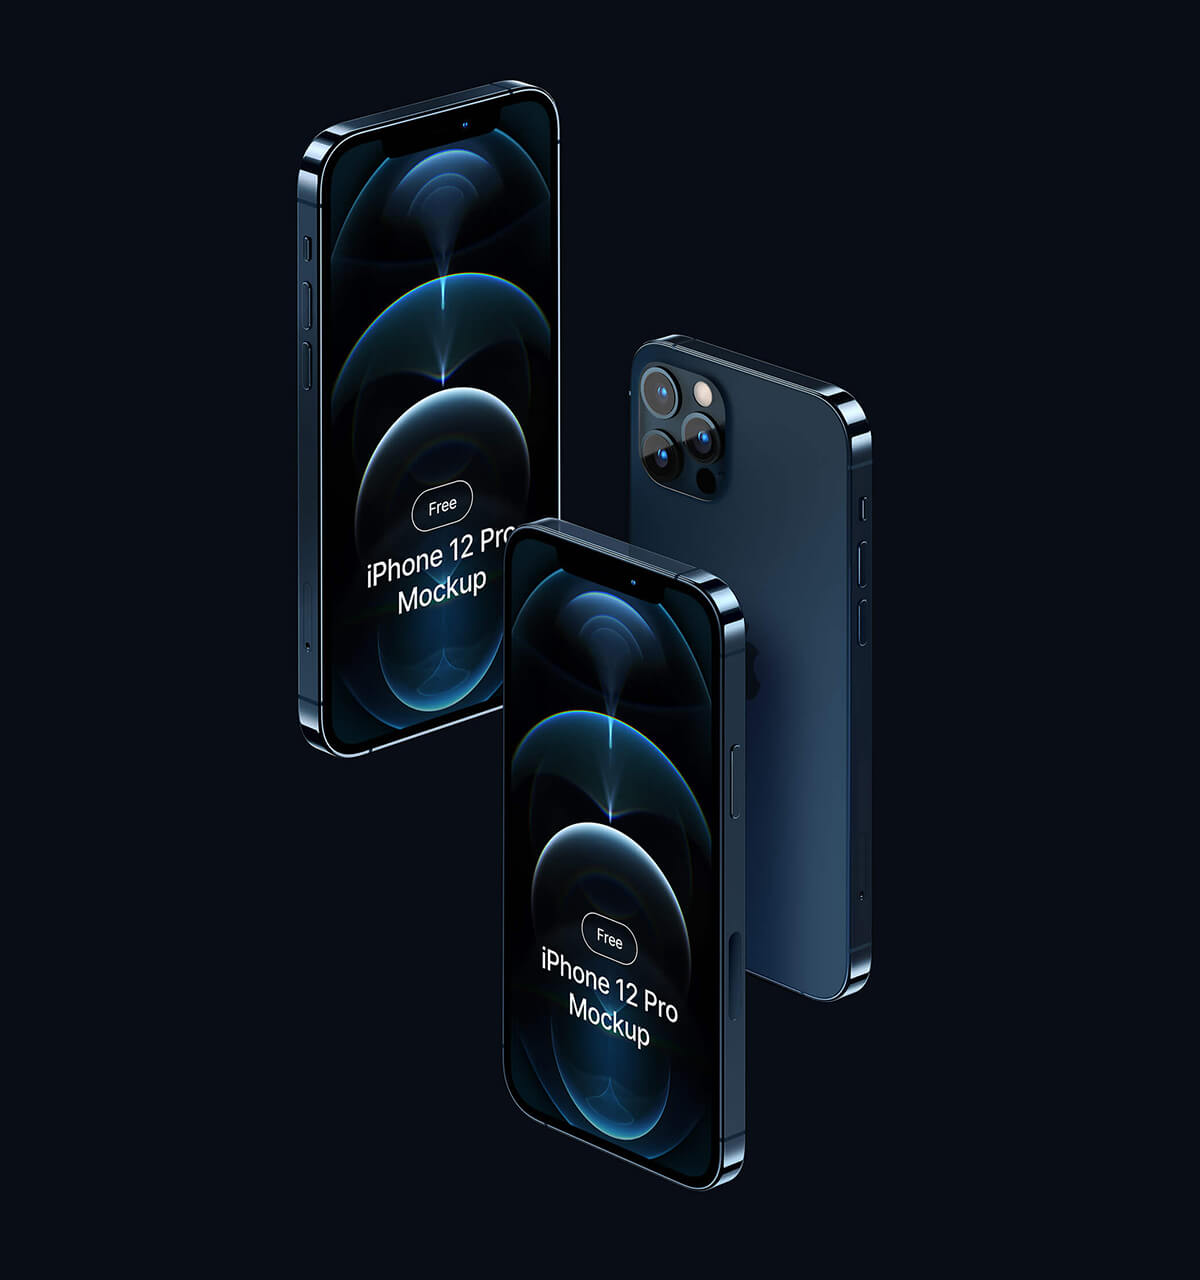 Free-iPhone-12-Pro-Mockup